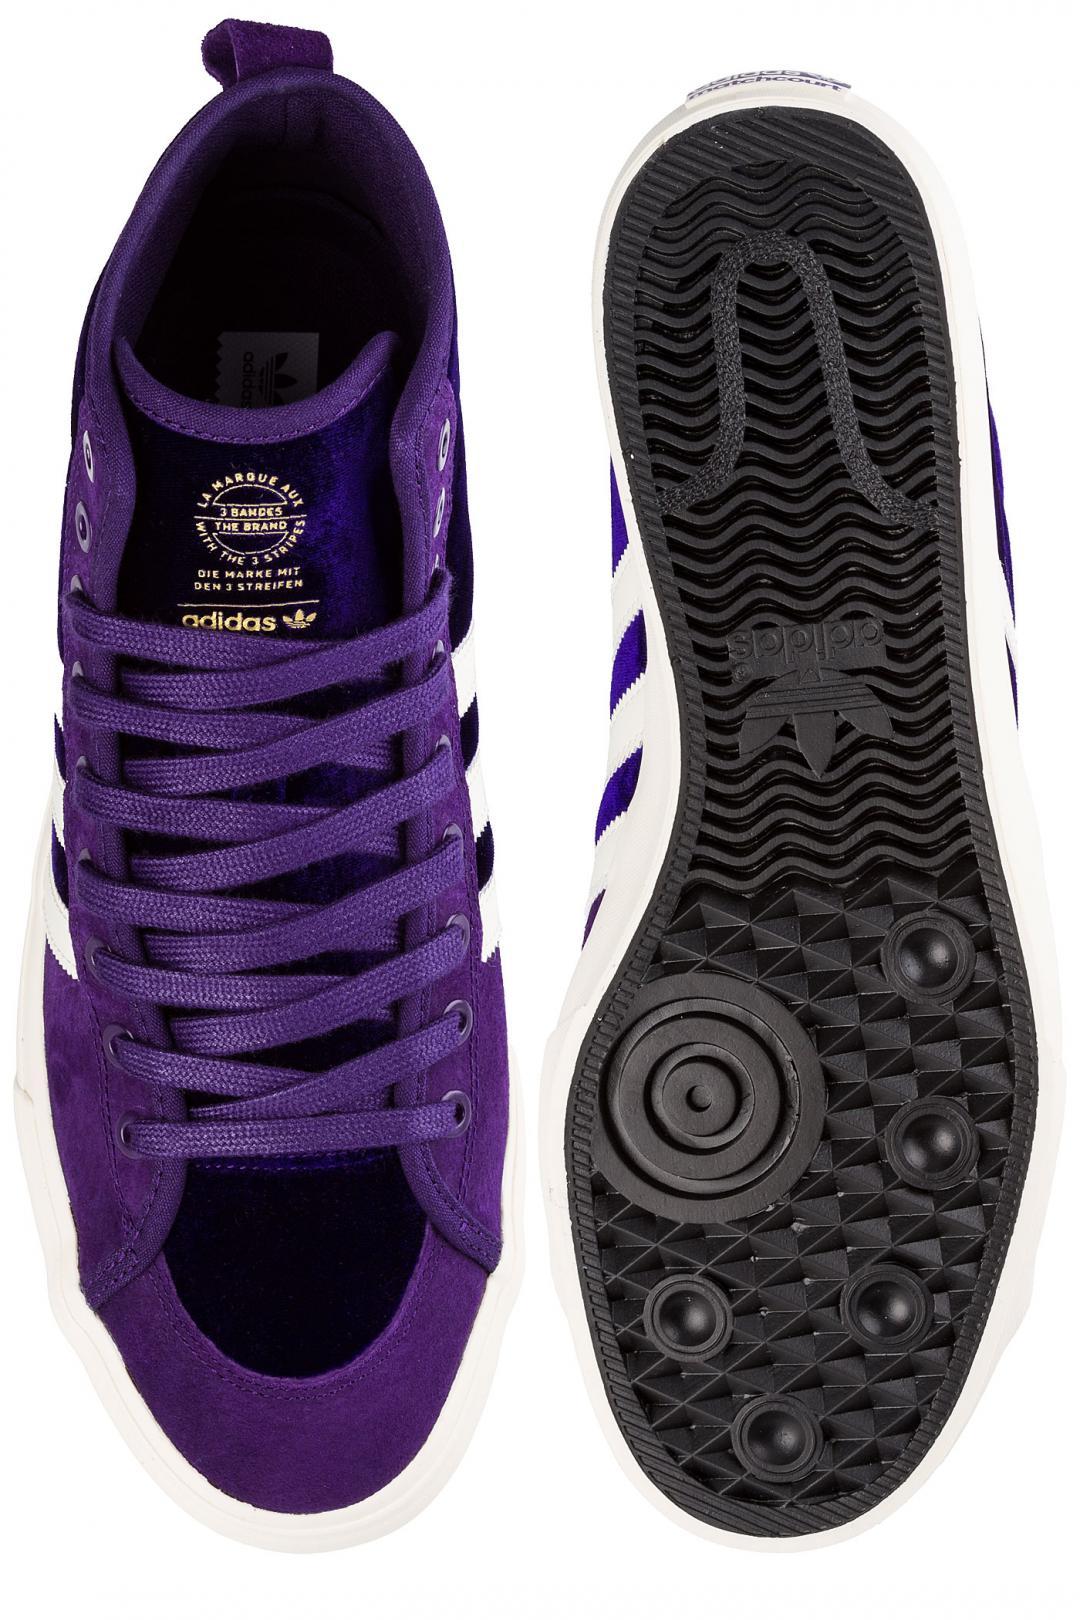 Uomo adidas Skateboarding Na-Kel Matchcourt High RX purple white gold   Scarpe da skate